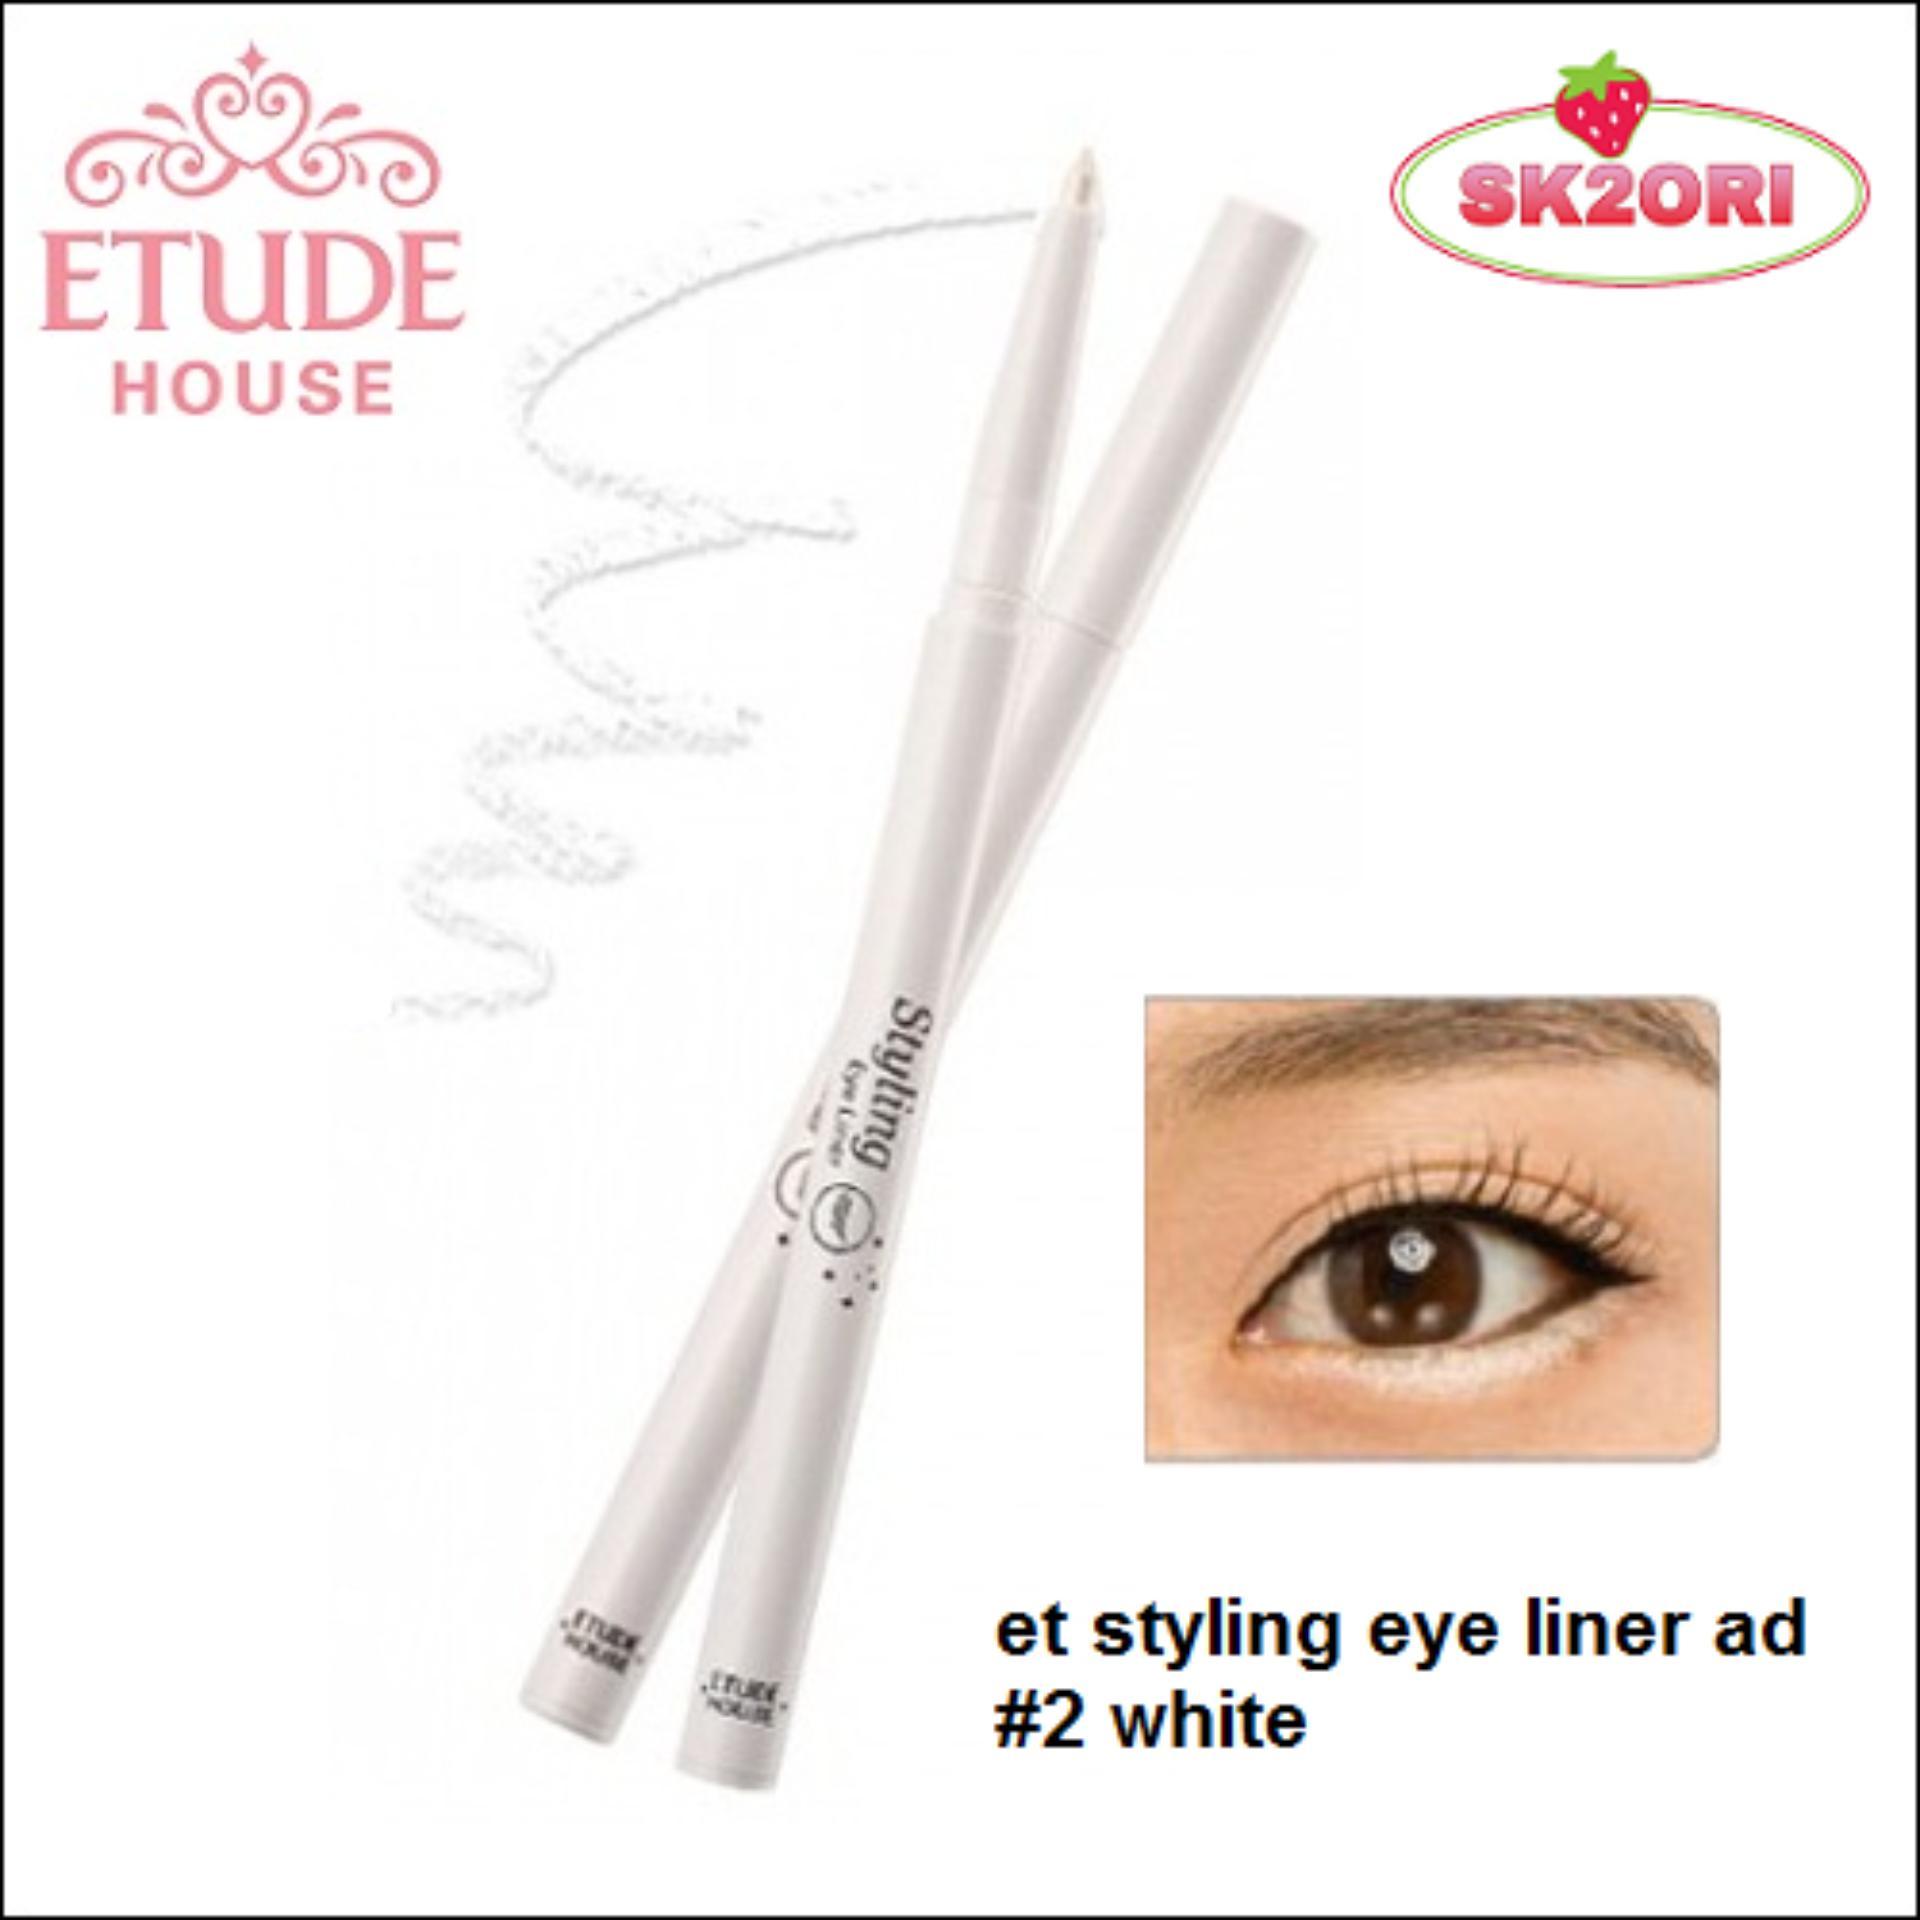 Etude House Styling Eyeliner 01black Daftar Harga Terbaru Indonesia Source Eye Liner 0 2g 2 White Lazada Malaysia